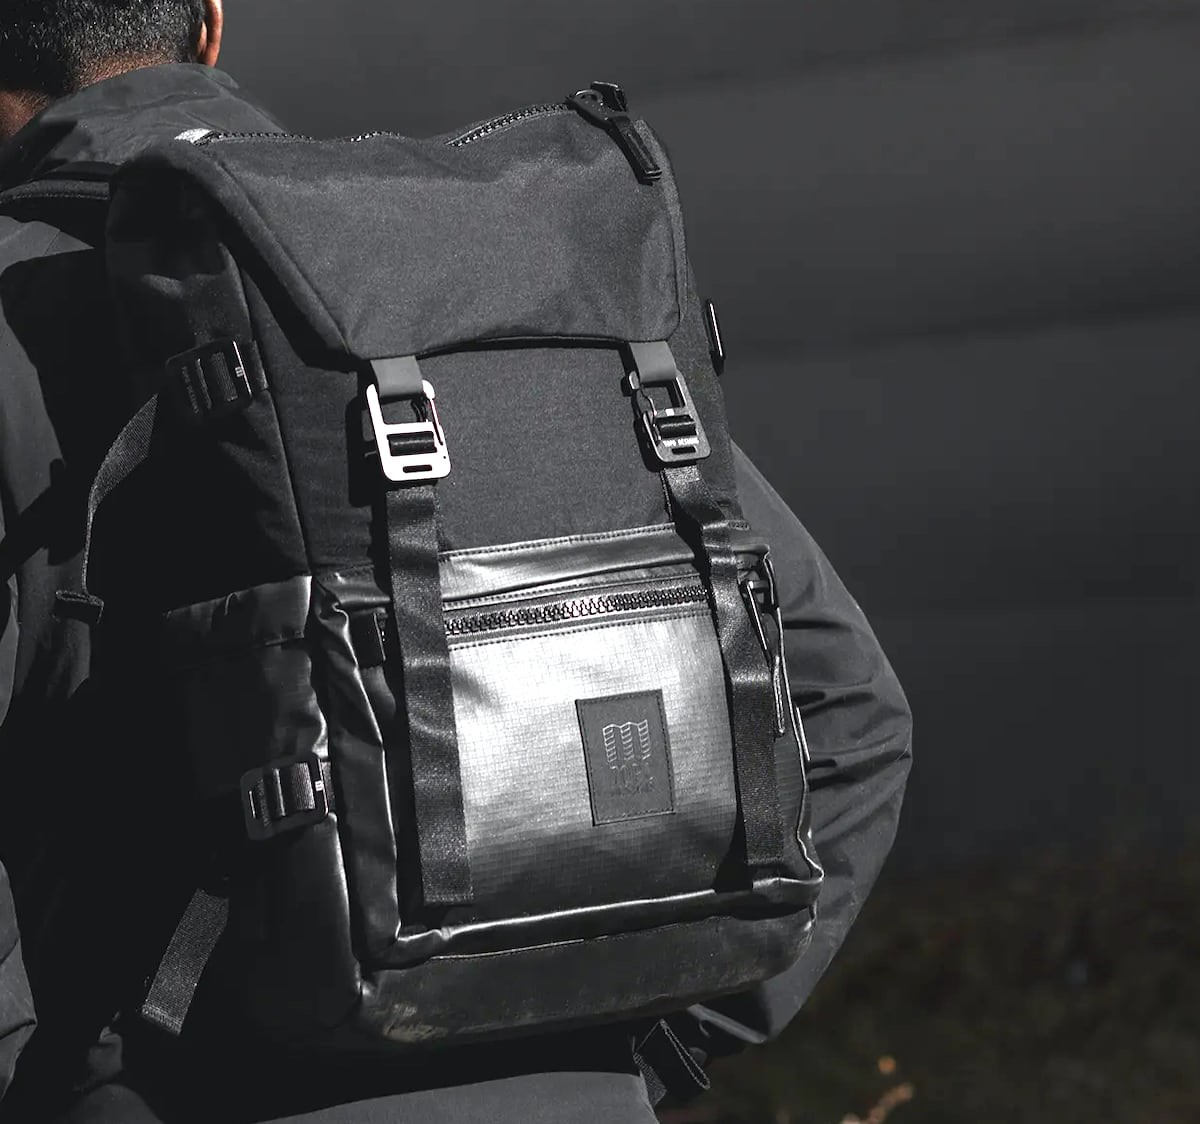 Topo Designs Rover Pack Premium Urban Backpack has a tough ripstop base